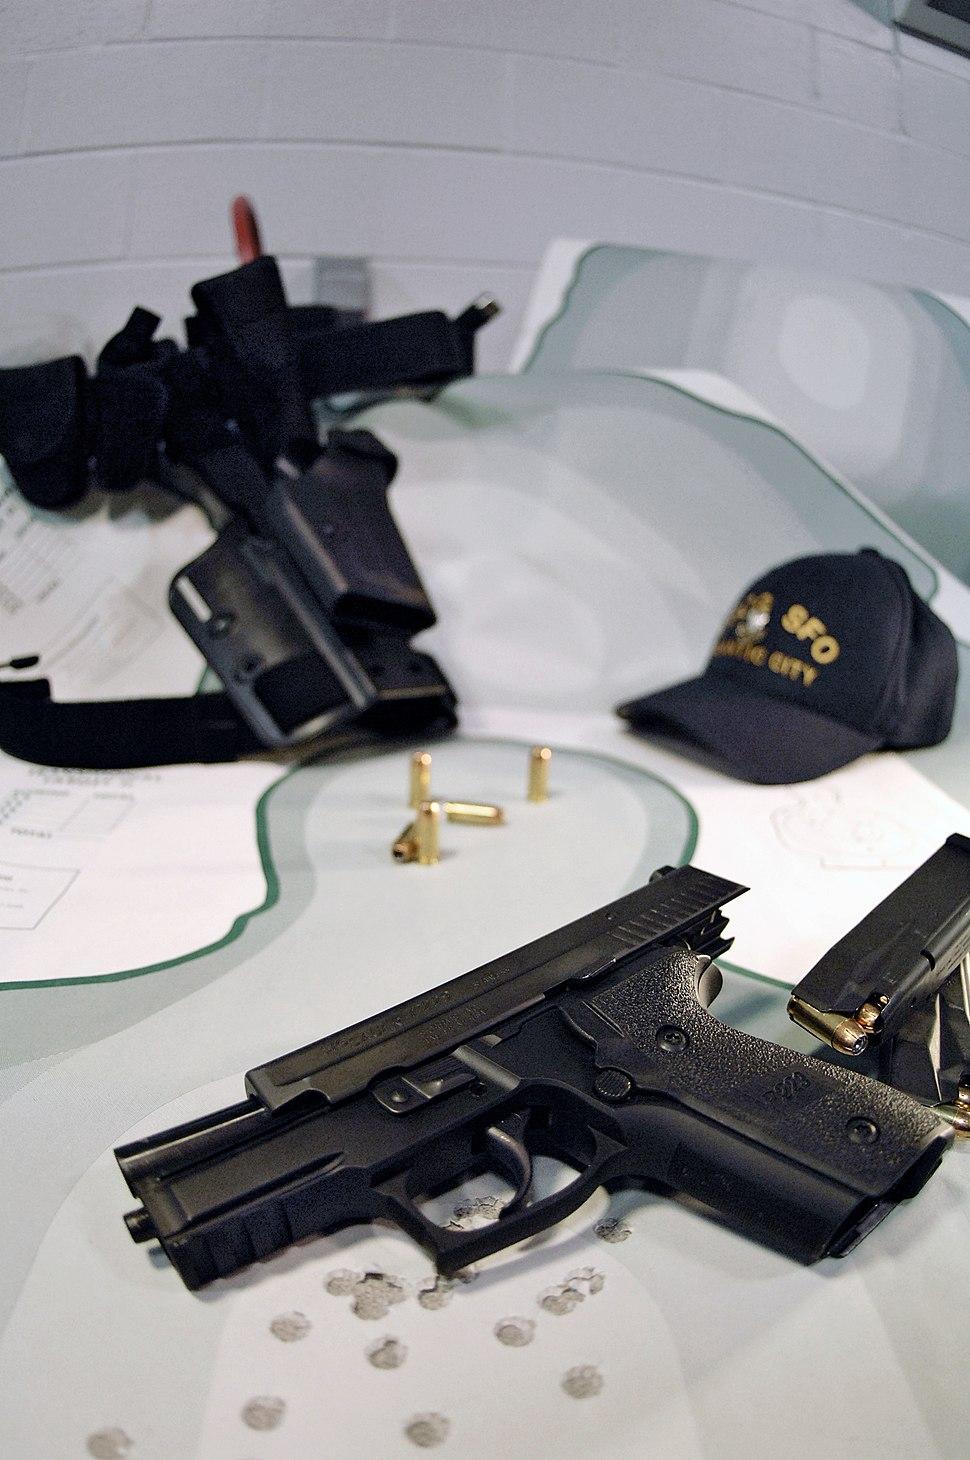 USCG SIG P229